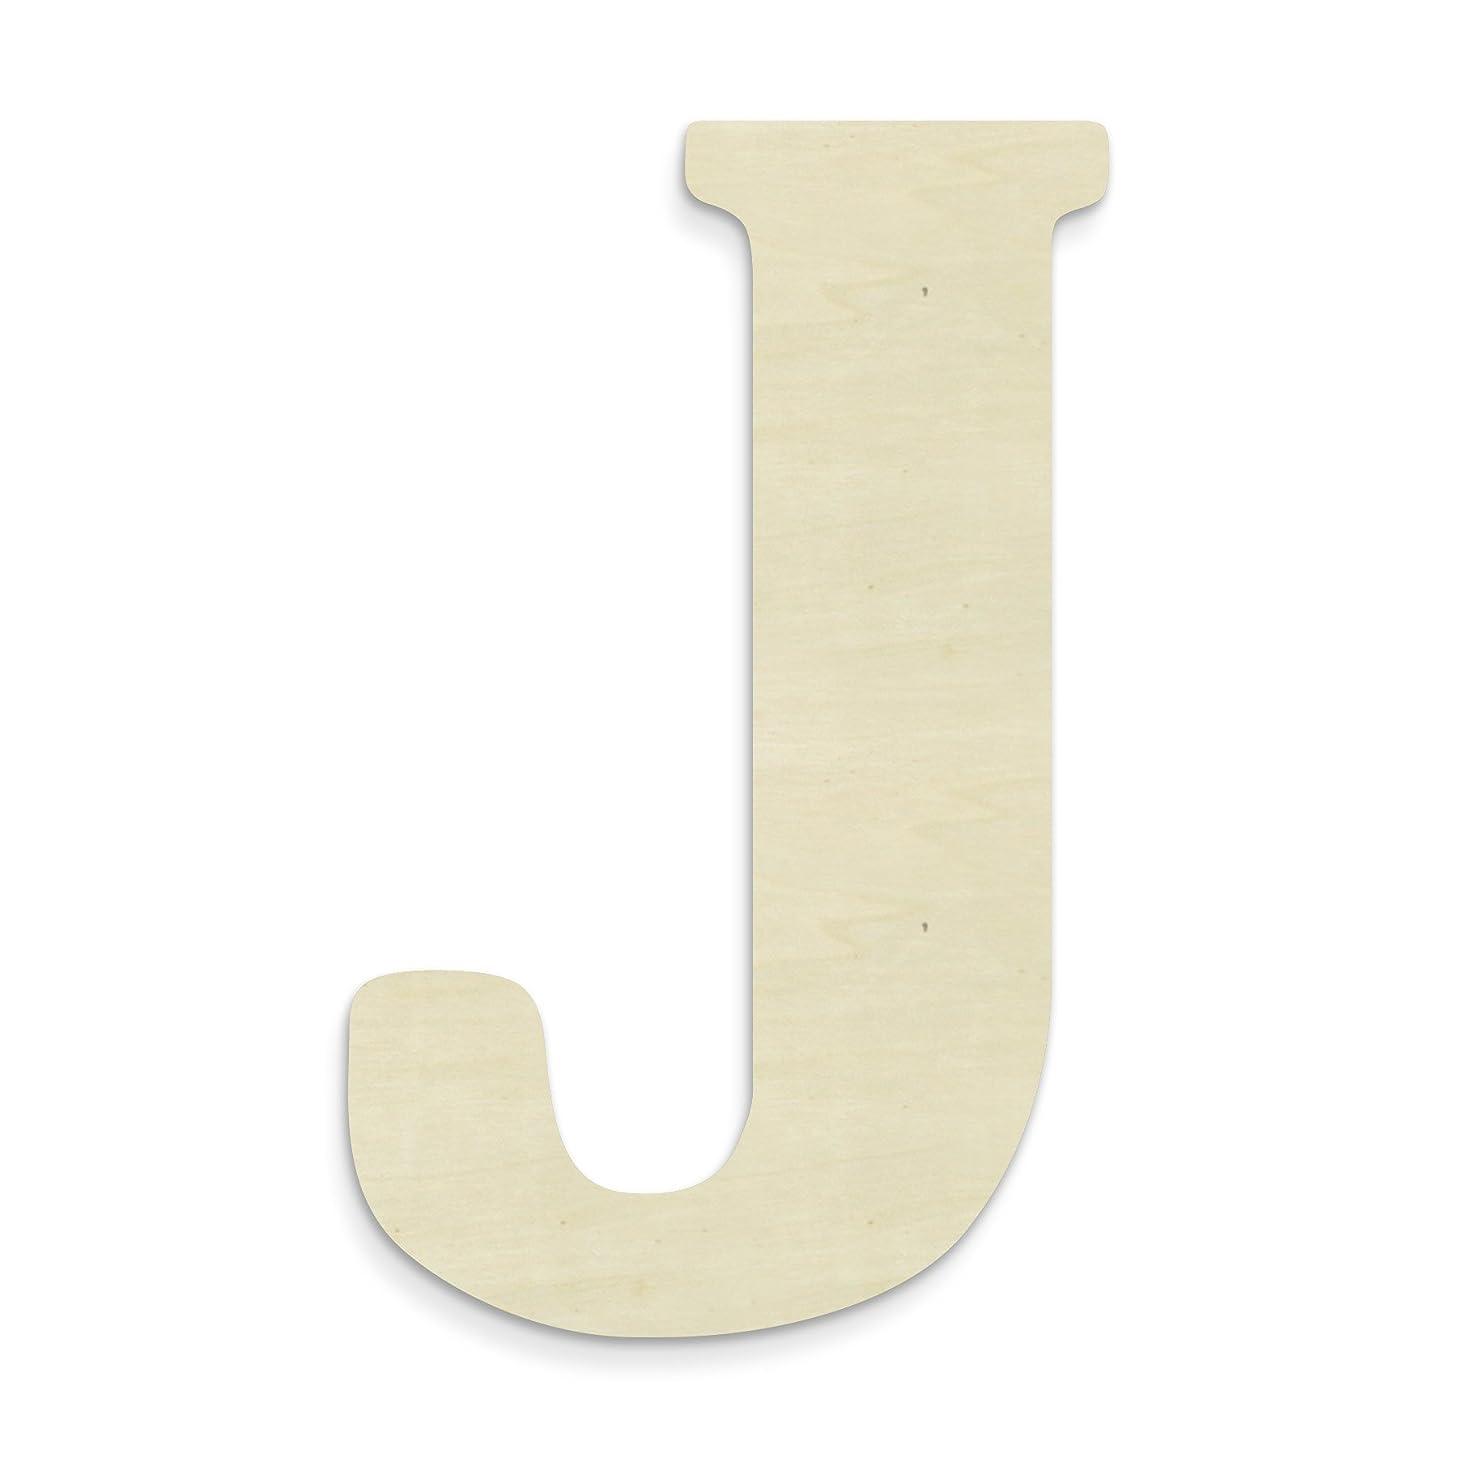 UNFINISHEDWOODCO Unfinished Wood Letter, 15-Inch, Monogrammed J, Large